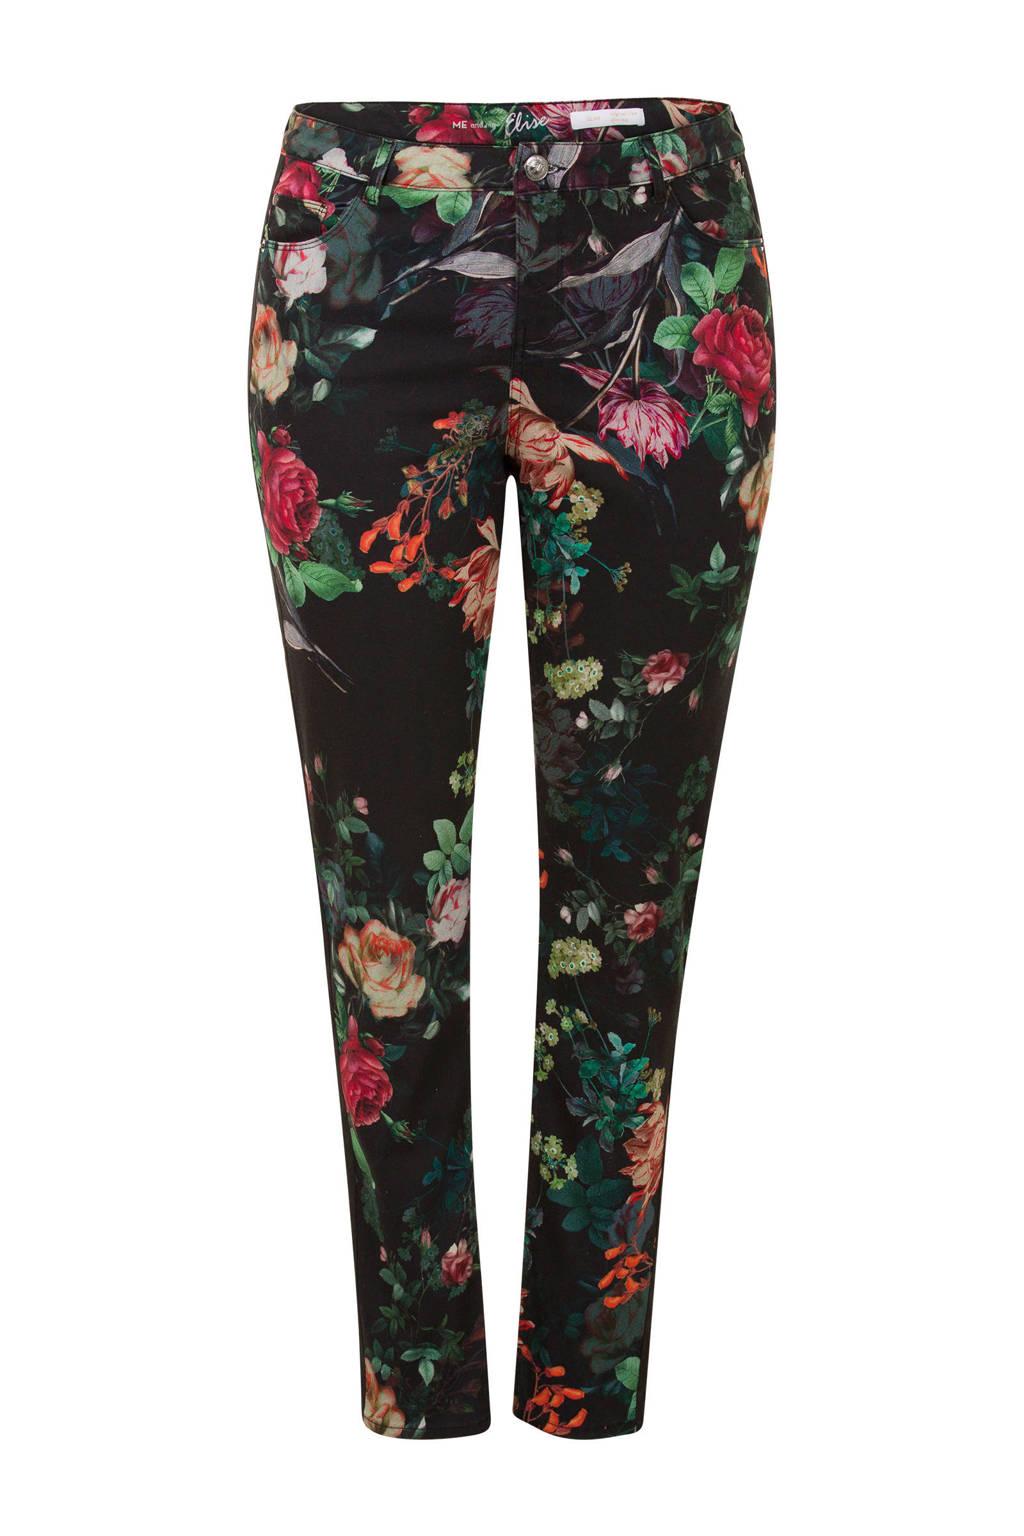 Miss Etam Plus gebloemde slim fit broek zwart, Zwart/multi